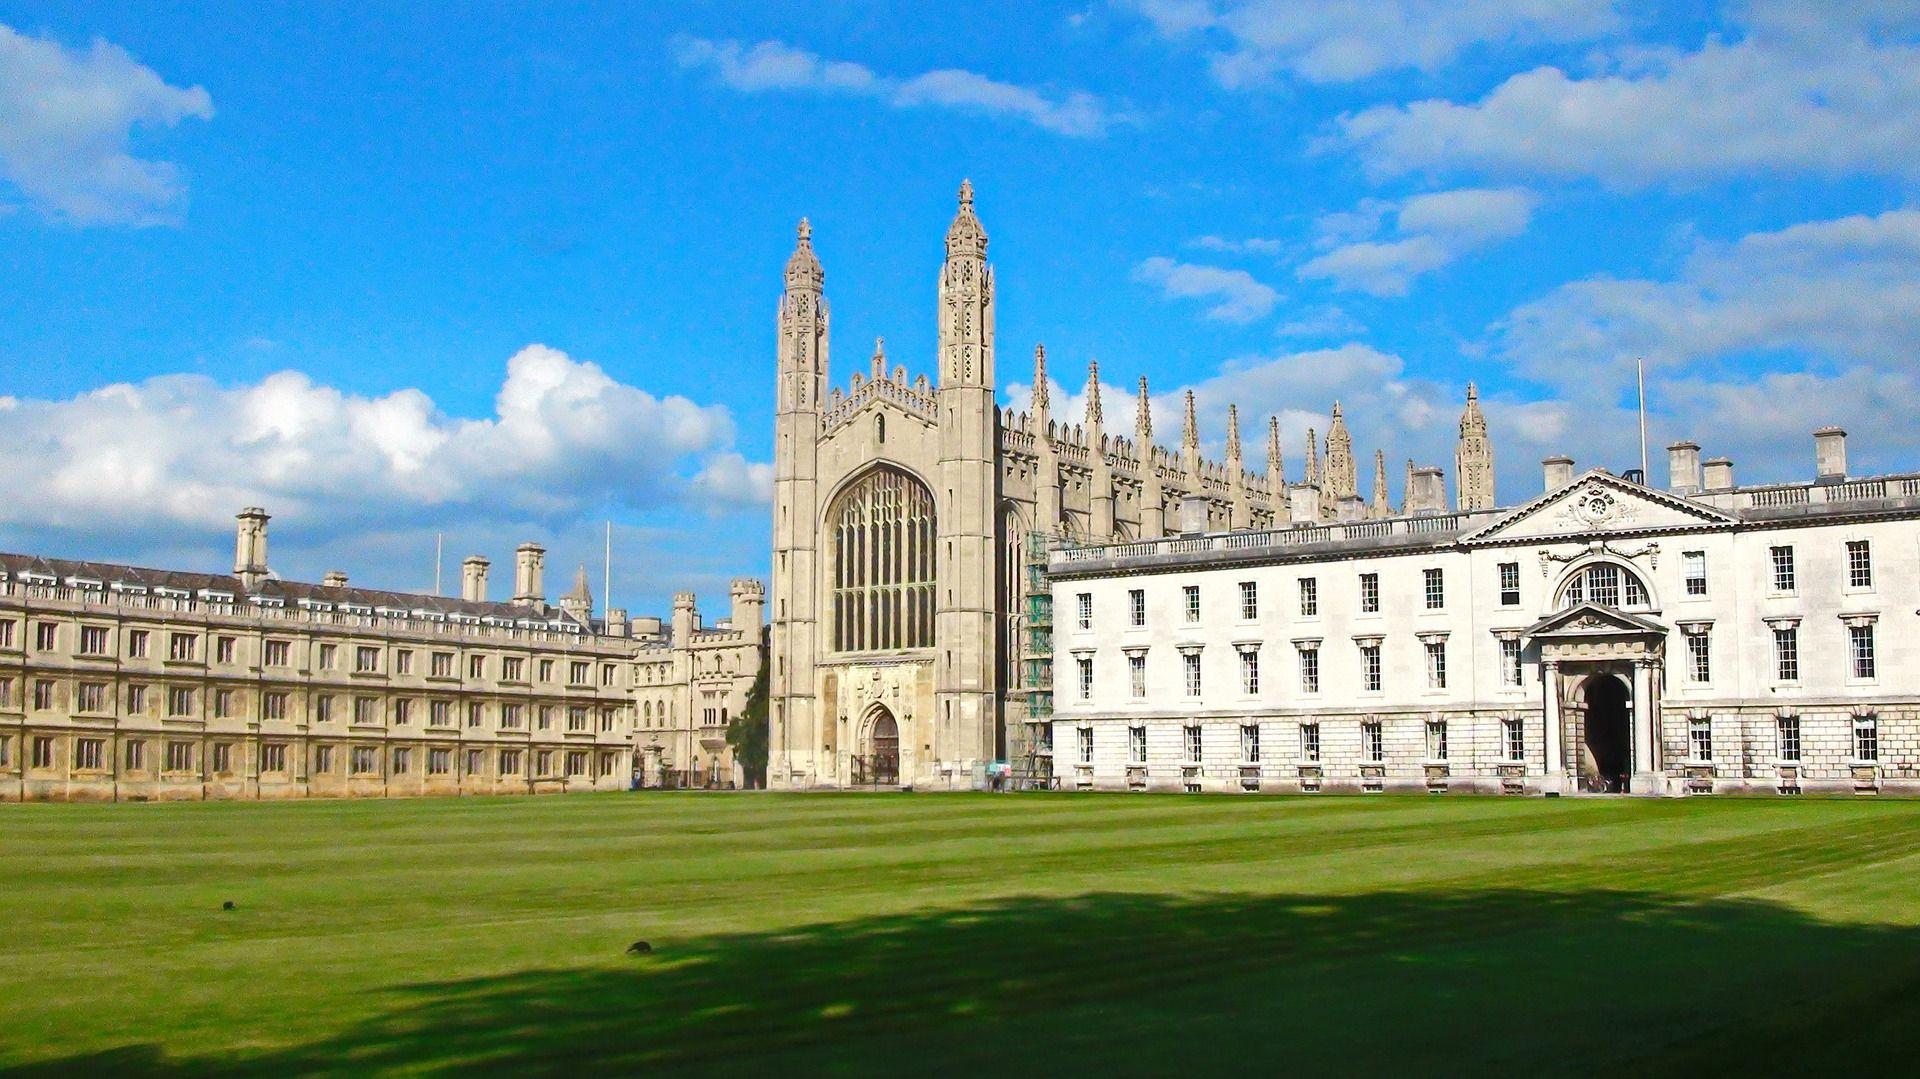 UK Universities Term No-Deal Brexit 'Biggest Threat' over Loss of EU Money, Students